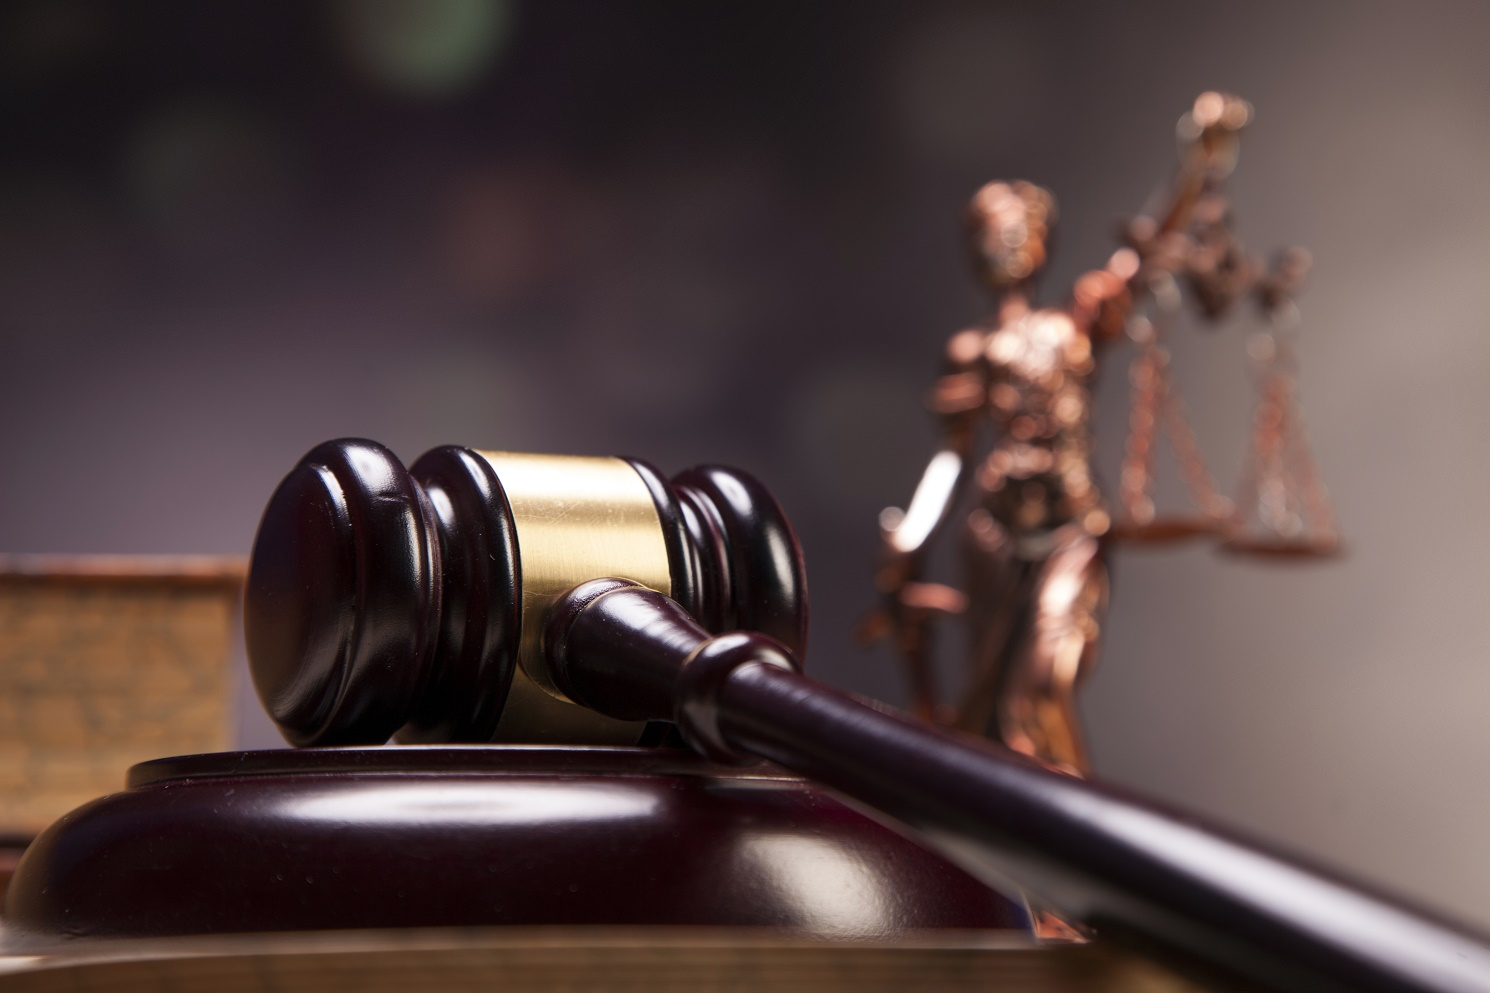 Суд осудил эколога, требующего взятку в 10 млн тенге, на 3 года